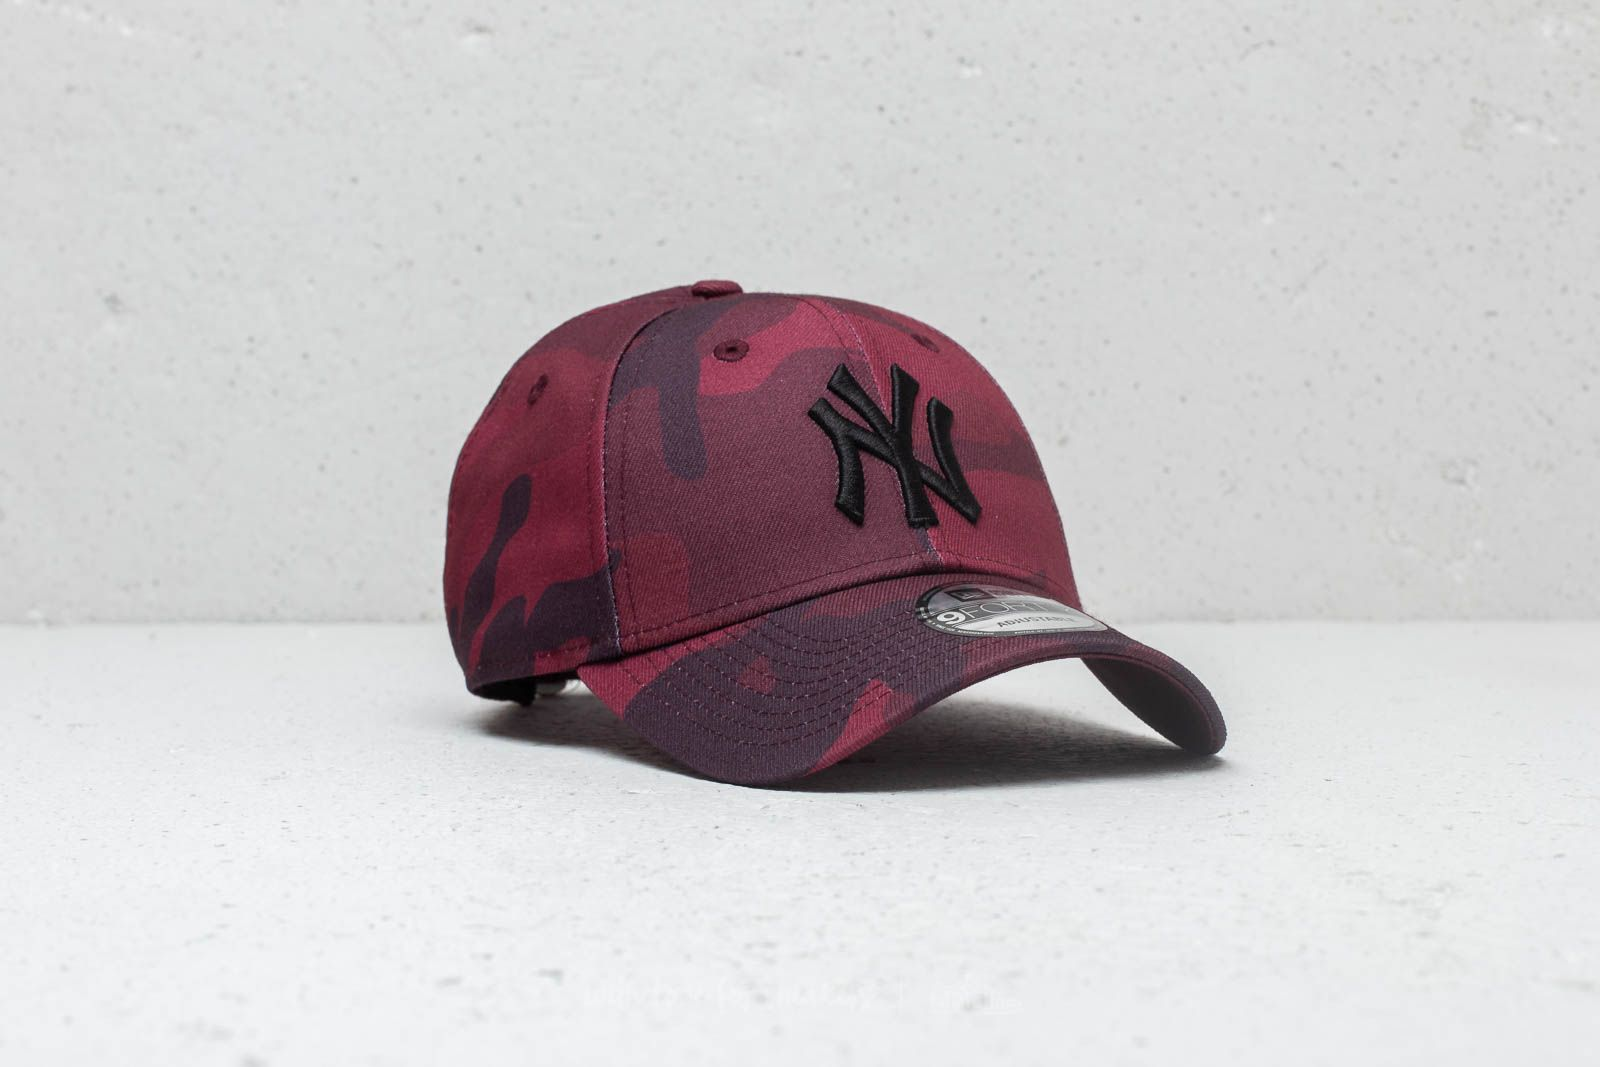 00e4eea2178645 New Era 9Forty MLB New York Yankees Cap Red Camo | Footshop